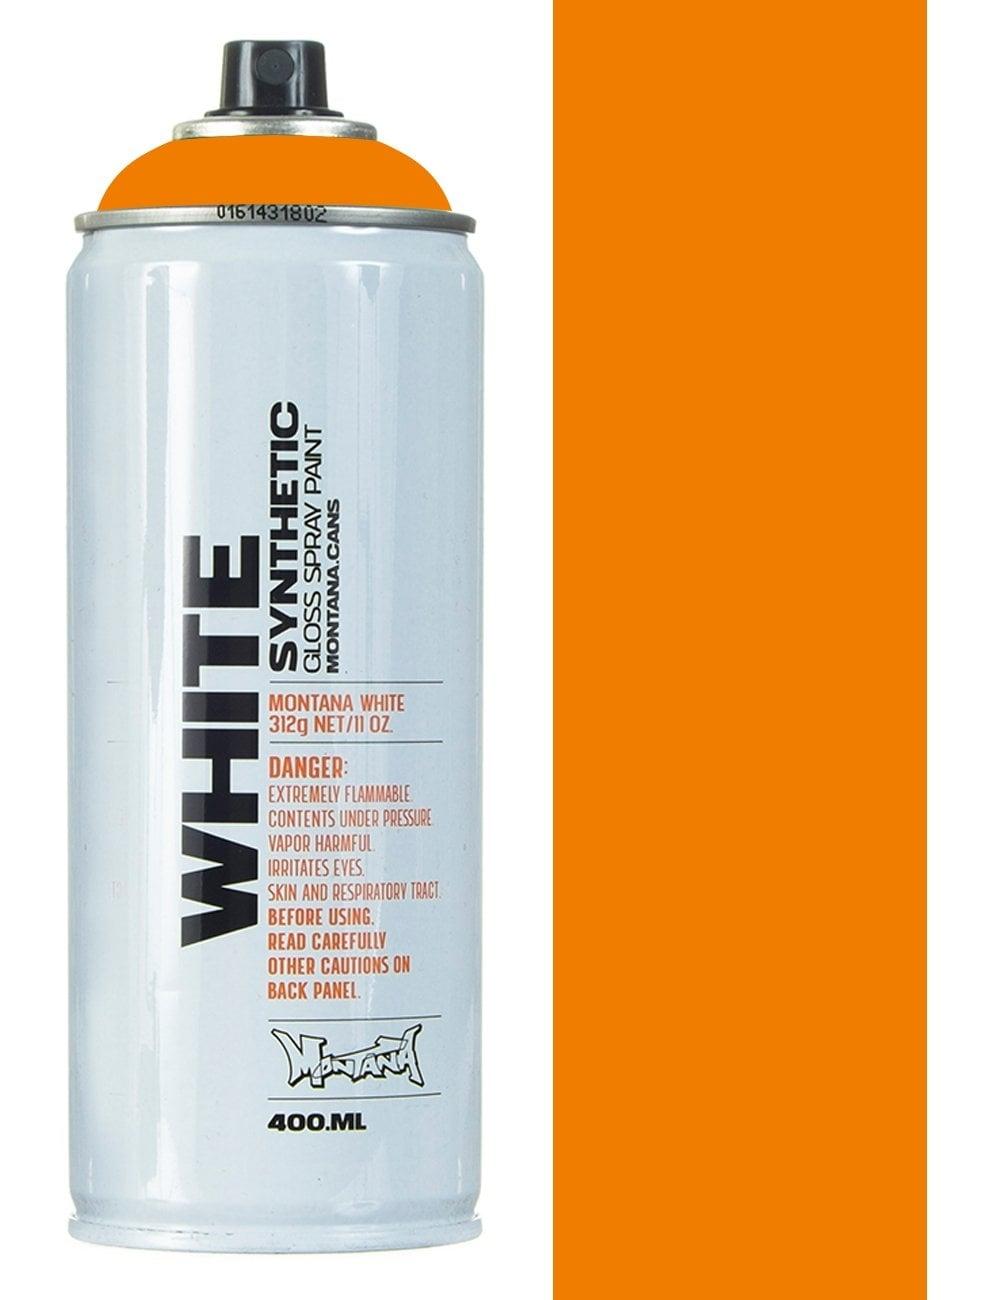 Montana White Bright Orange Spray Paint 400ml Spray